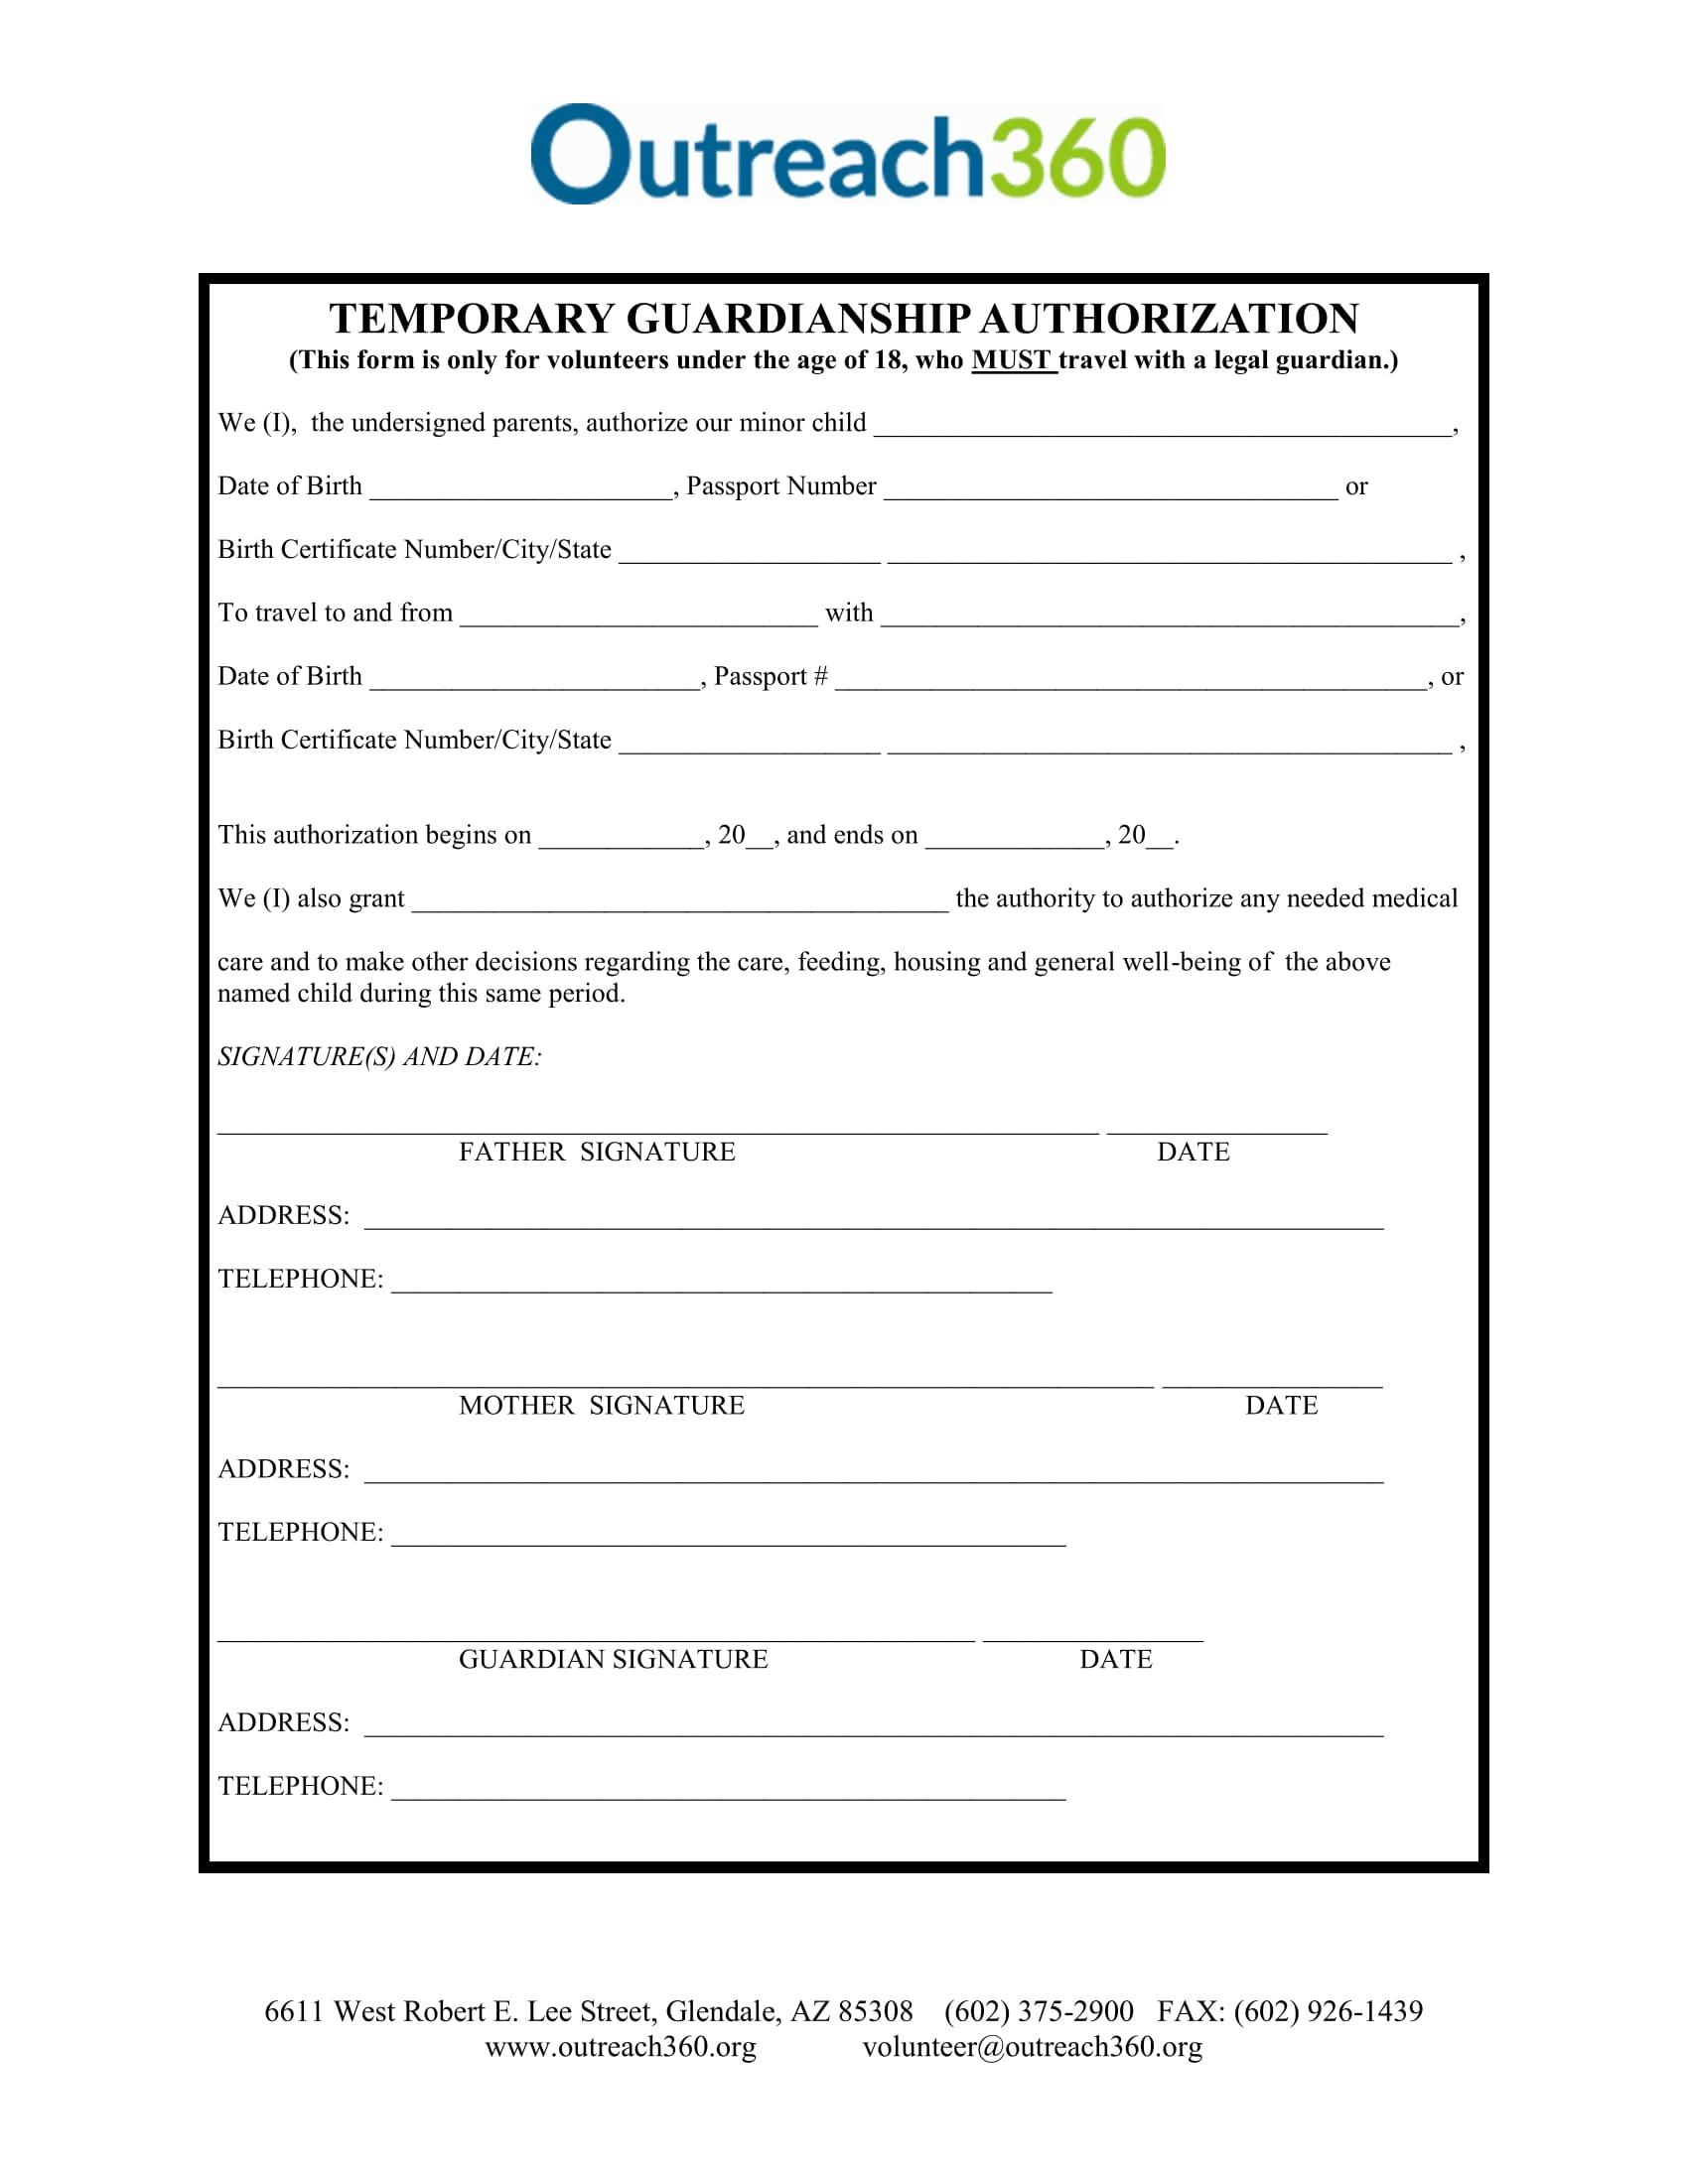 temporary guardianship authorization 11